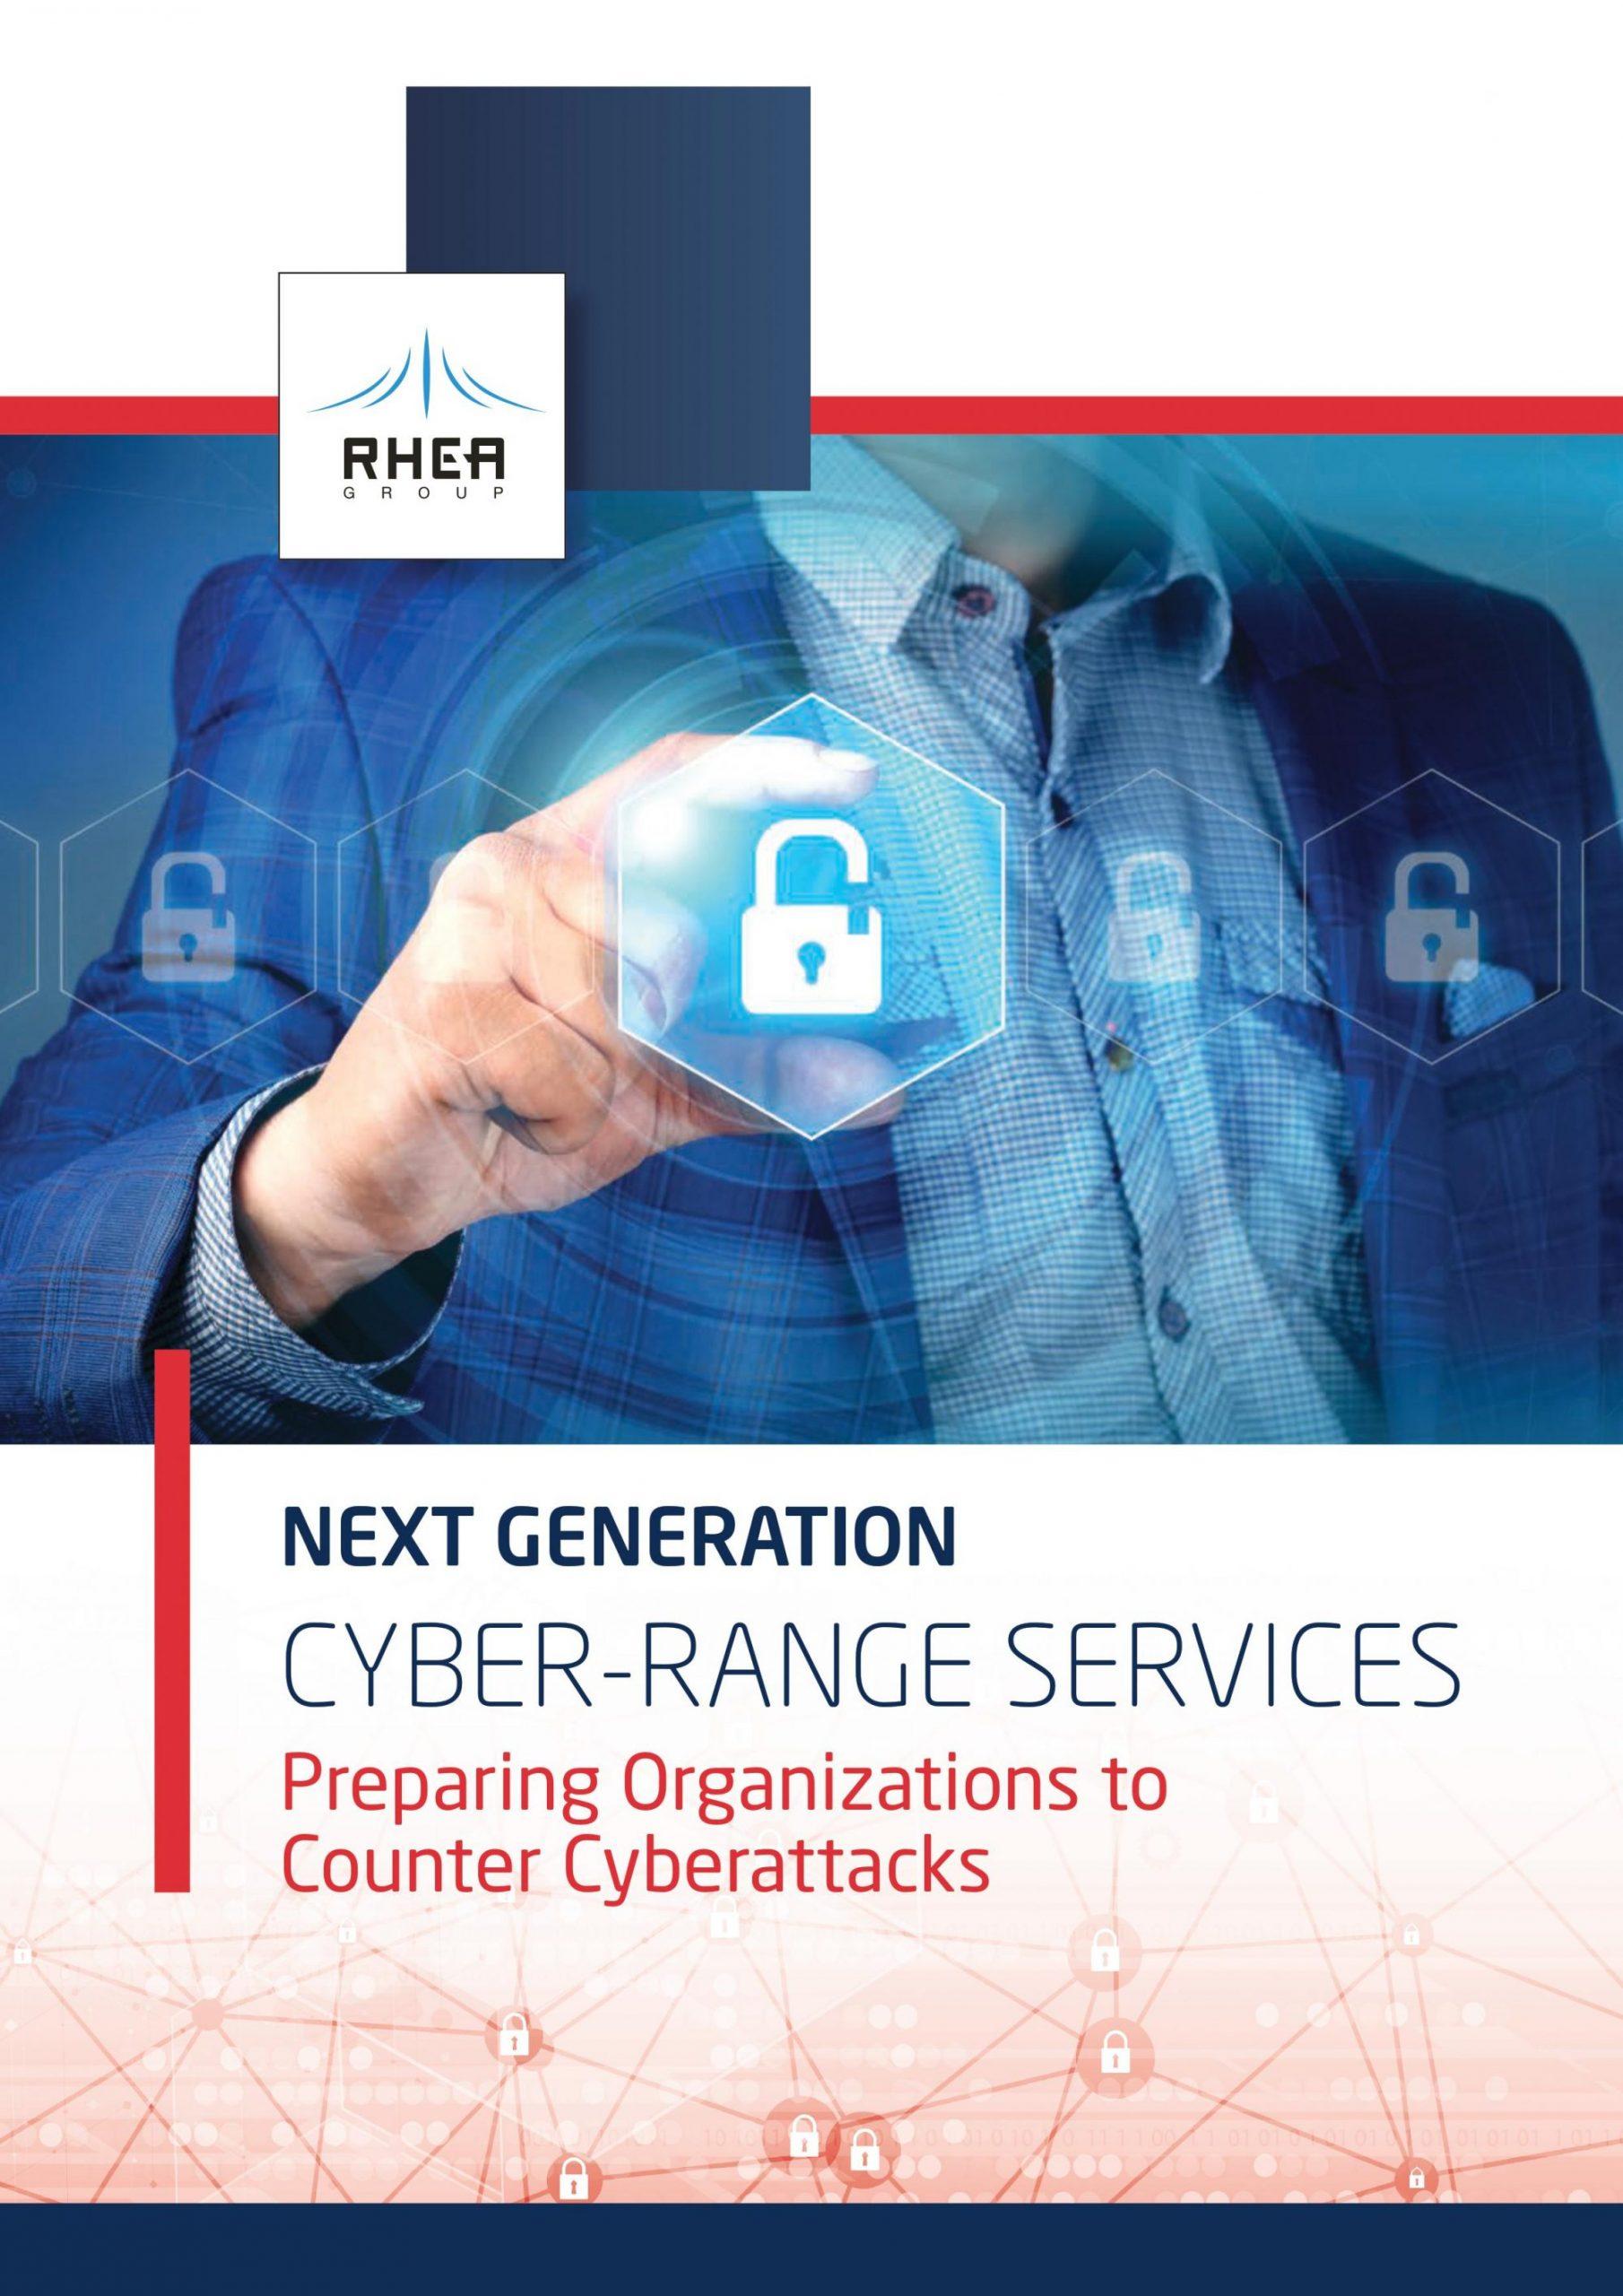 RHEA Group Cyber-Range Services brochure cover